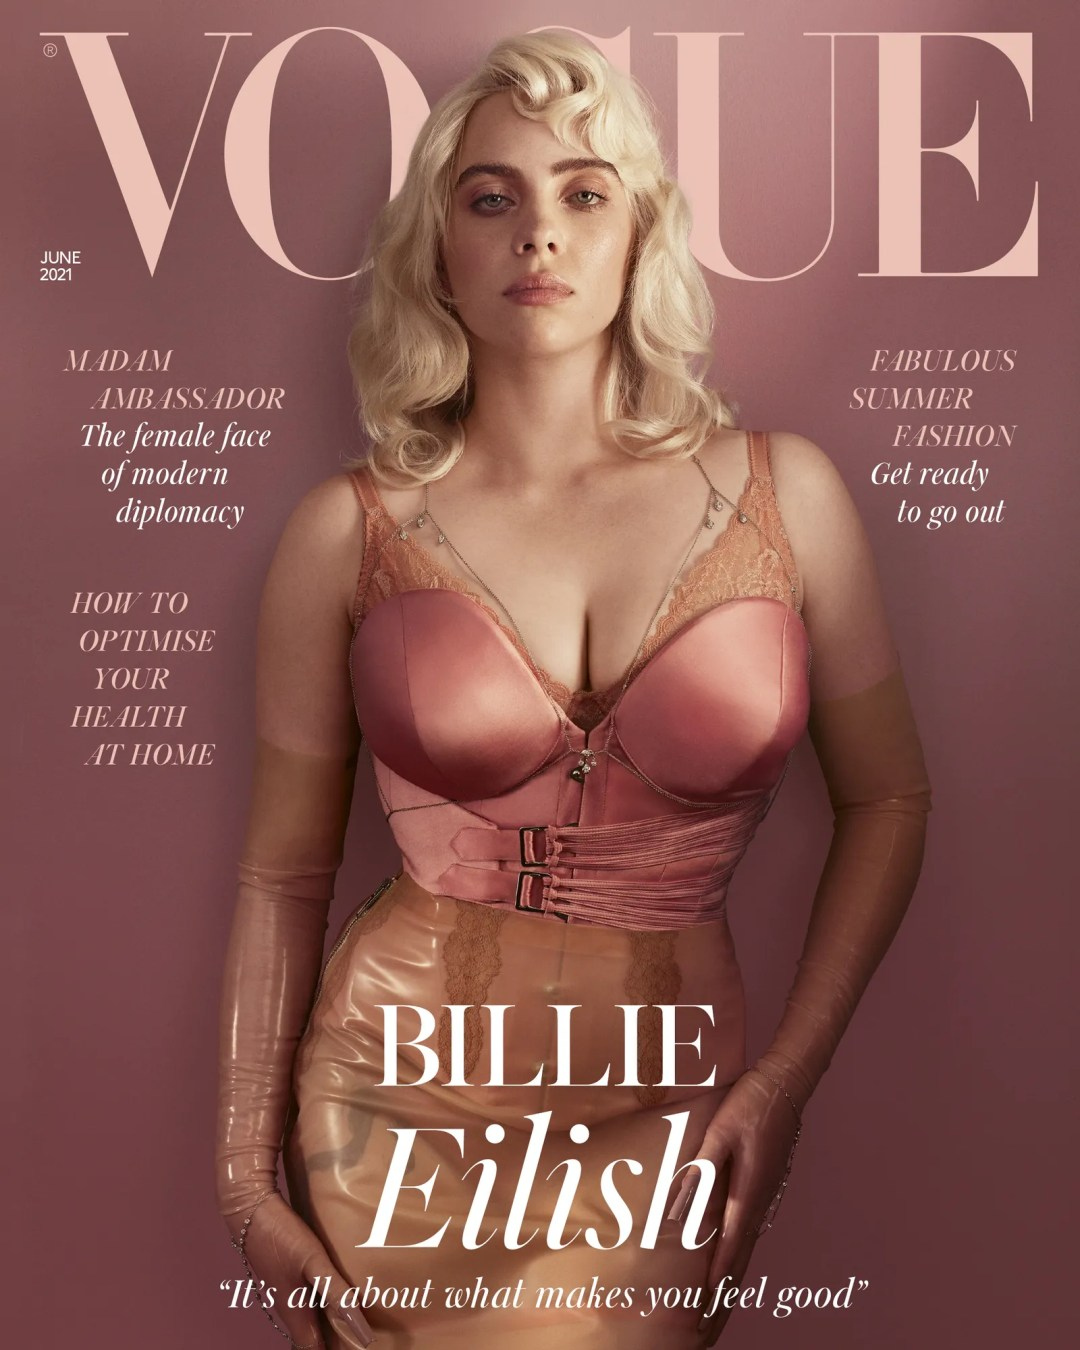 Billie Eilish on the June 2021 cover of British Vogue.